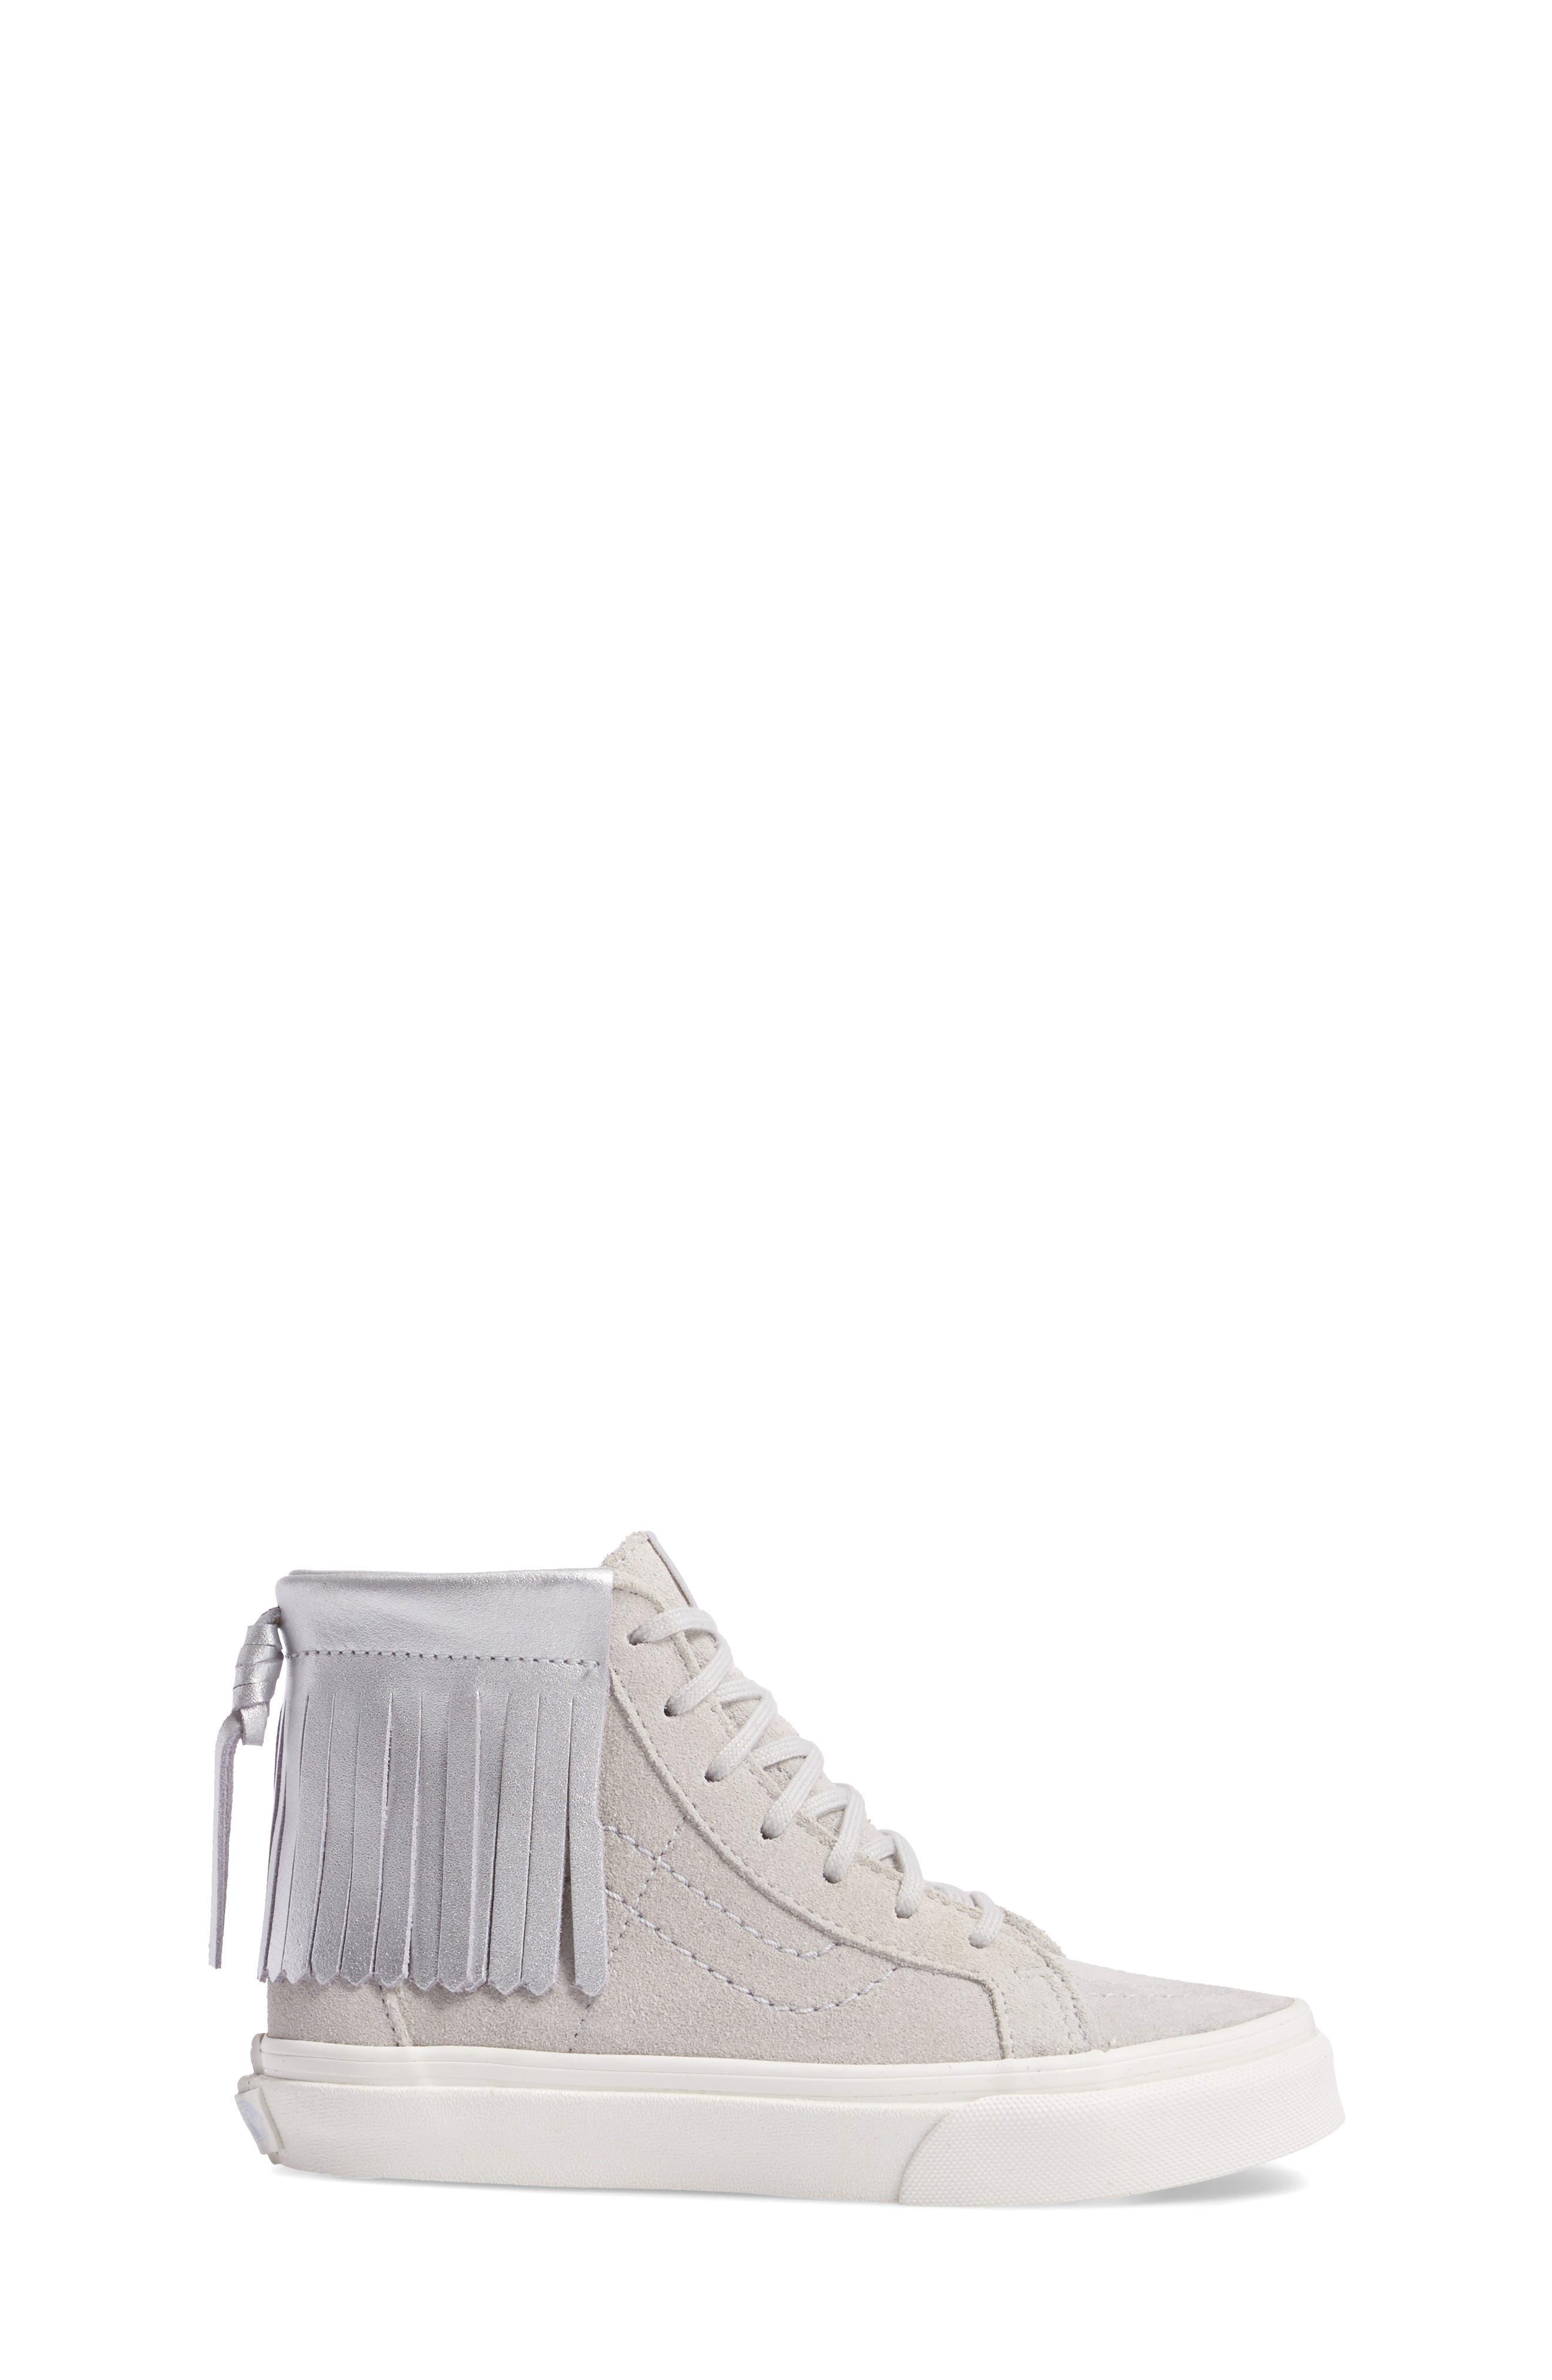 Sk8-Hi Moc Sneaker,                             Alternate thumbnail 3, color,                             Metallic Glacier Gray